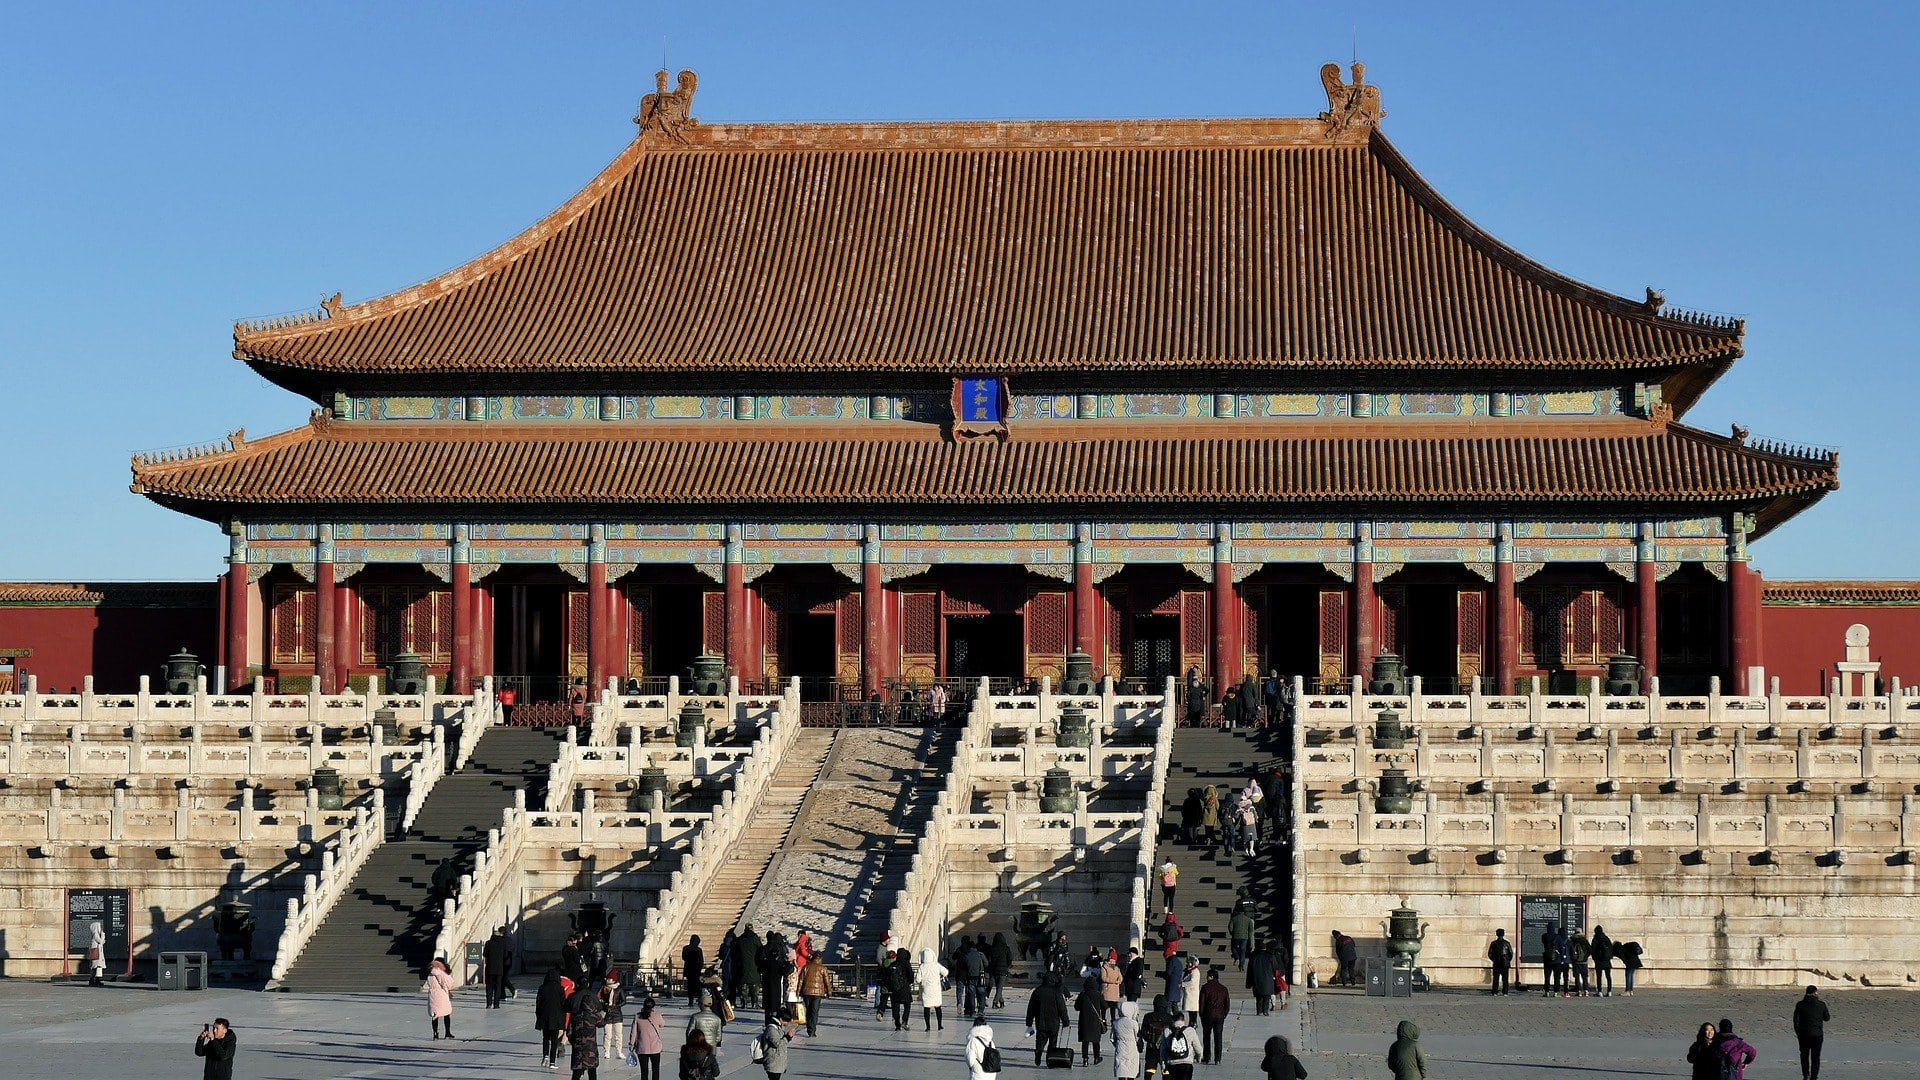 Tiananmen-pladsen